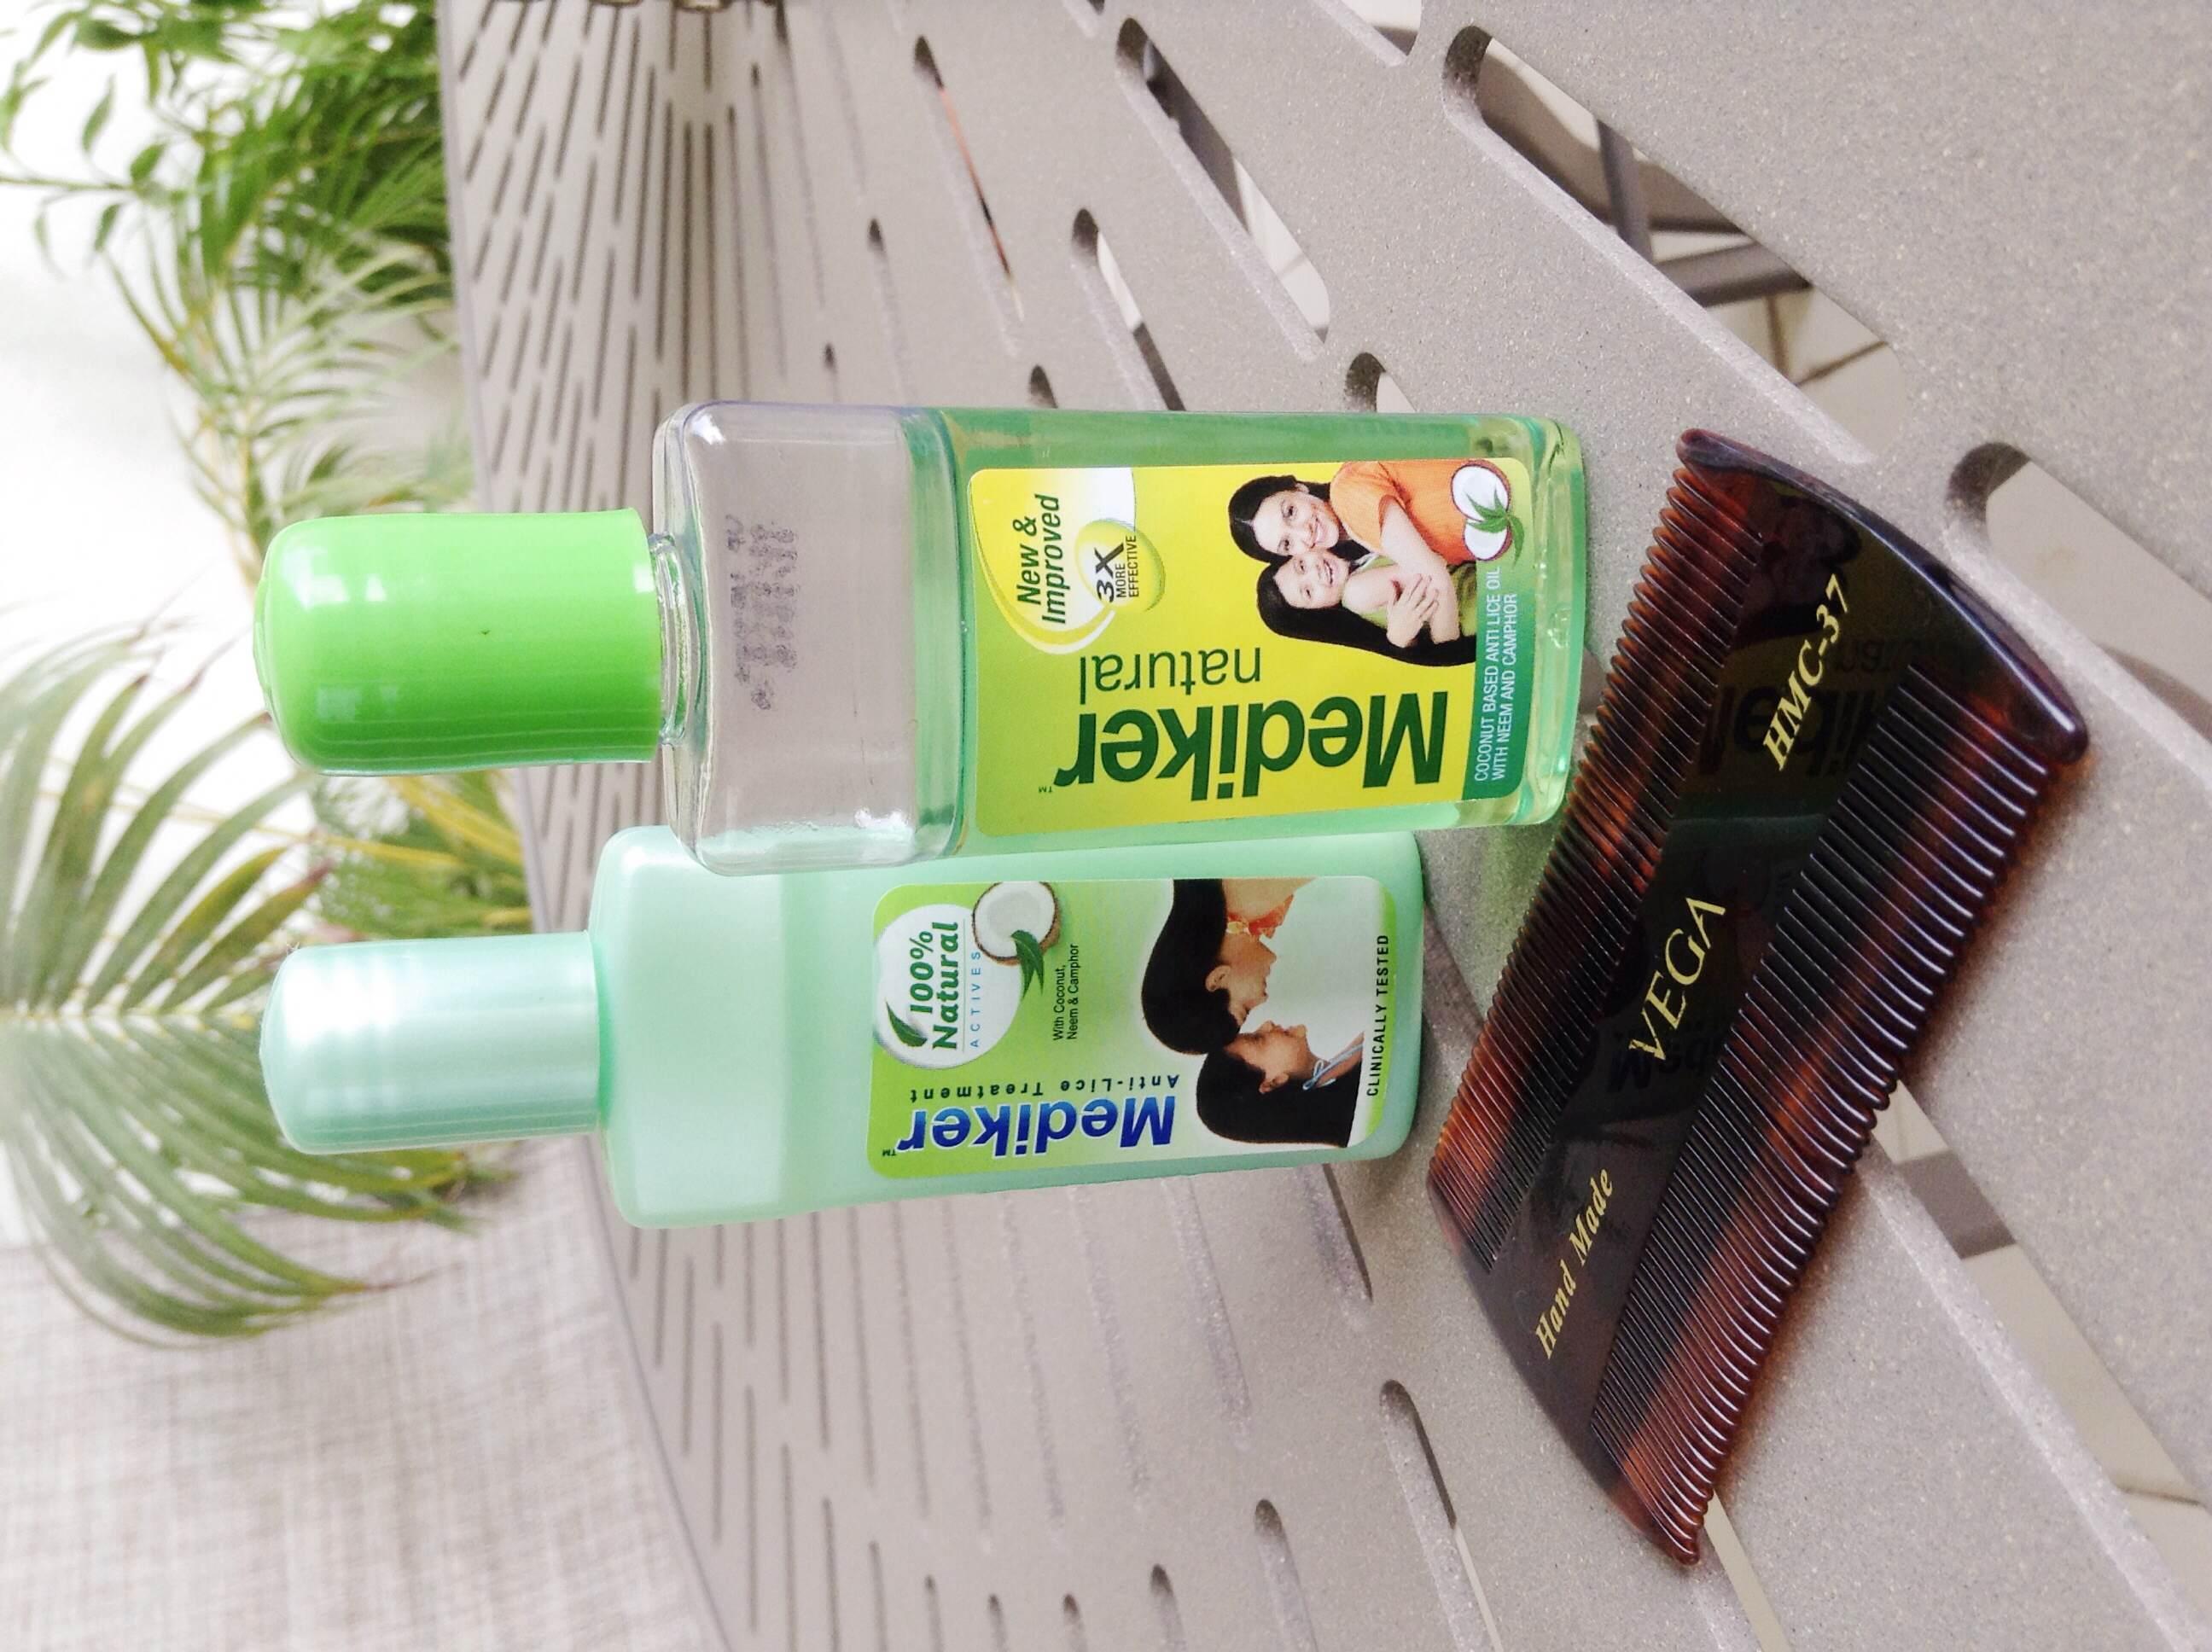 mediker lice treatment for kids in India